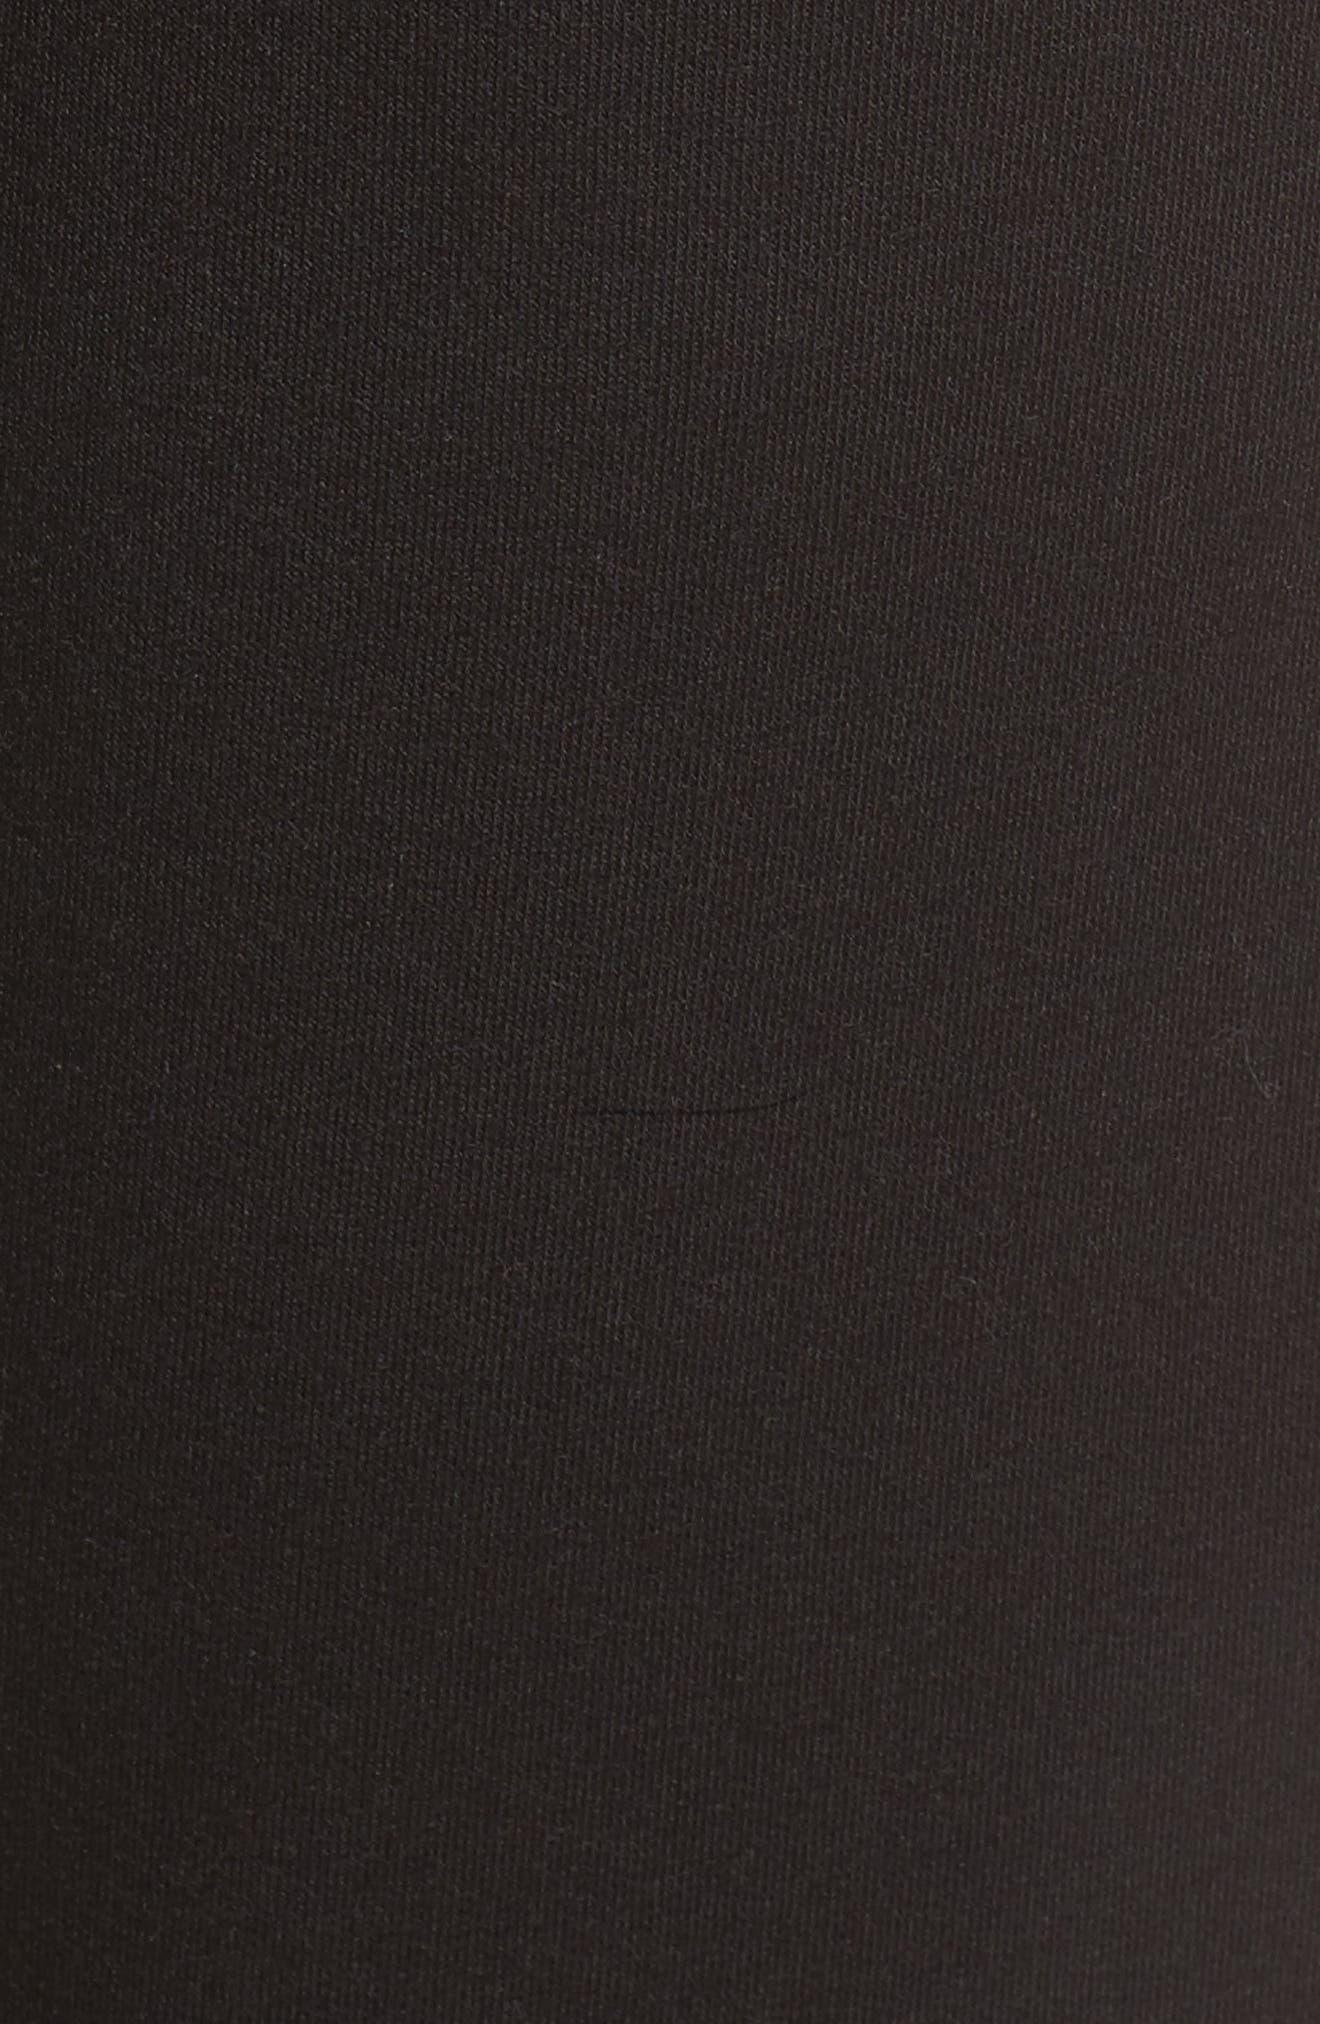 Zip Sweatpants,                             Alternate thumbnail 6, color,                             Black